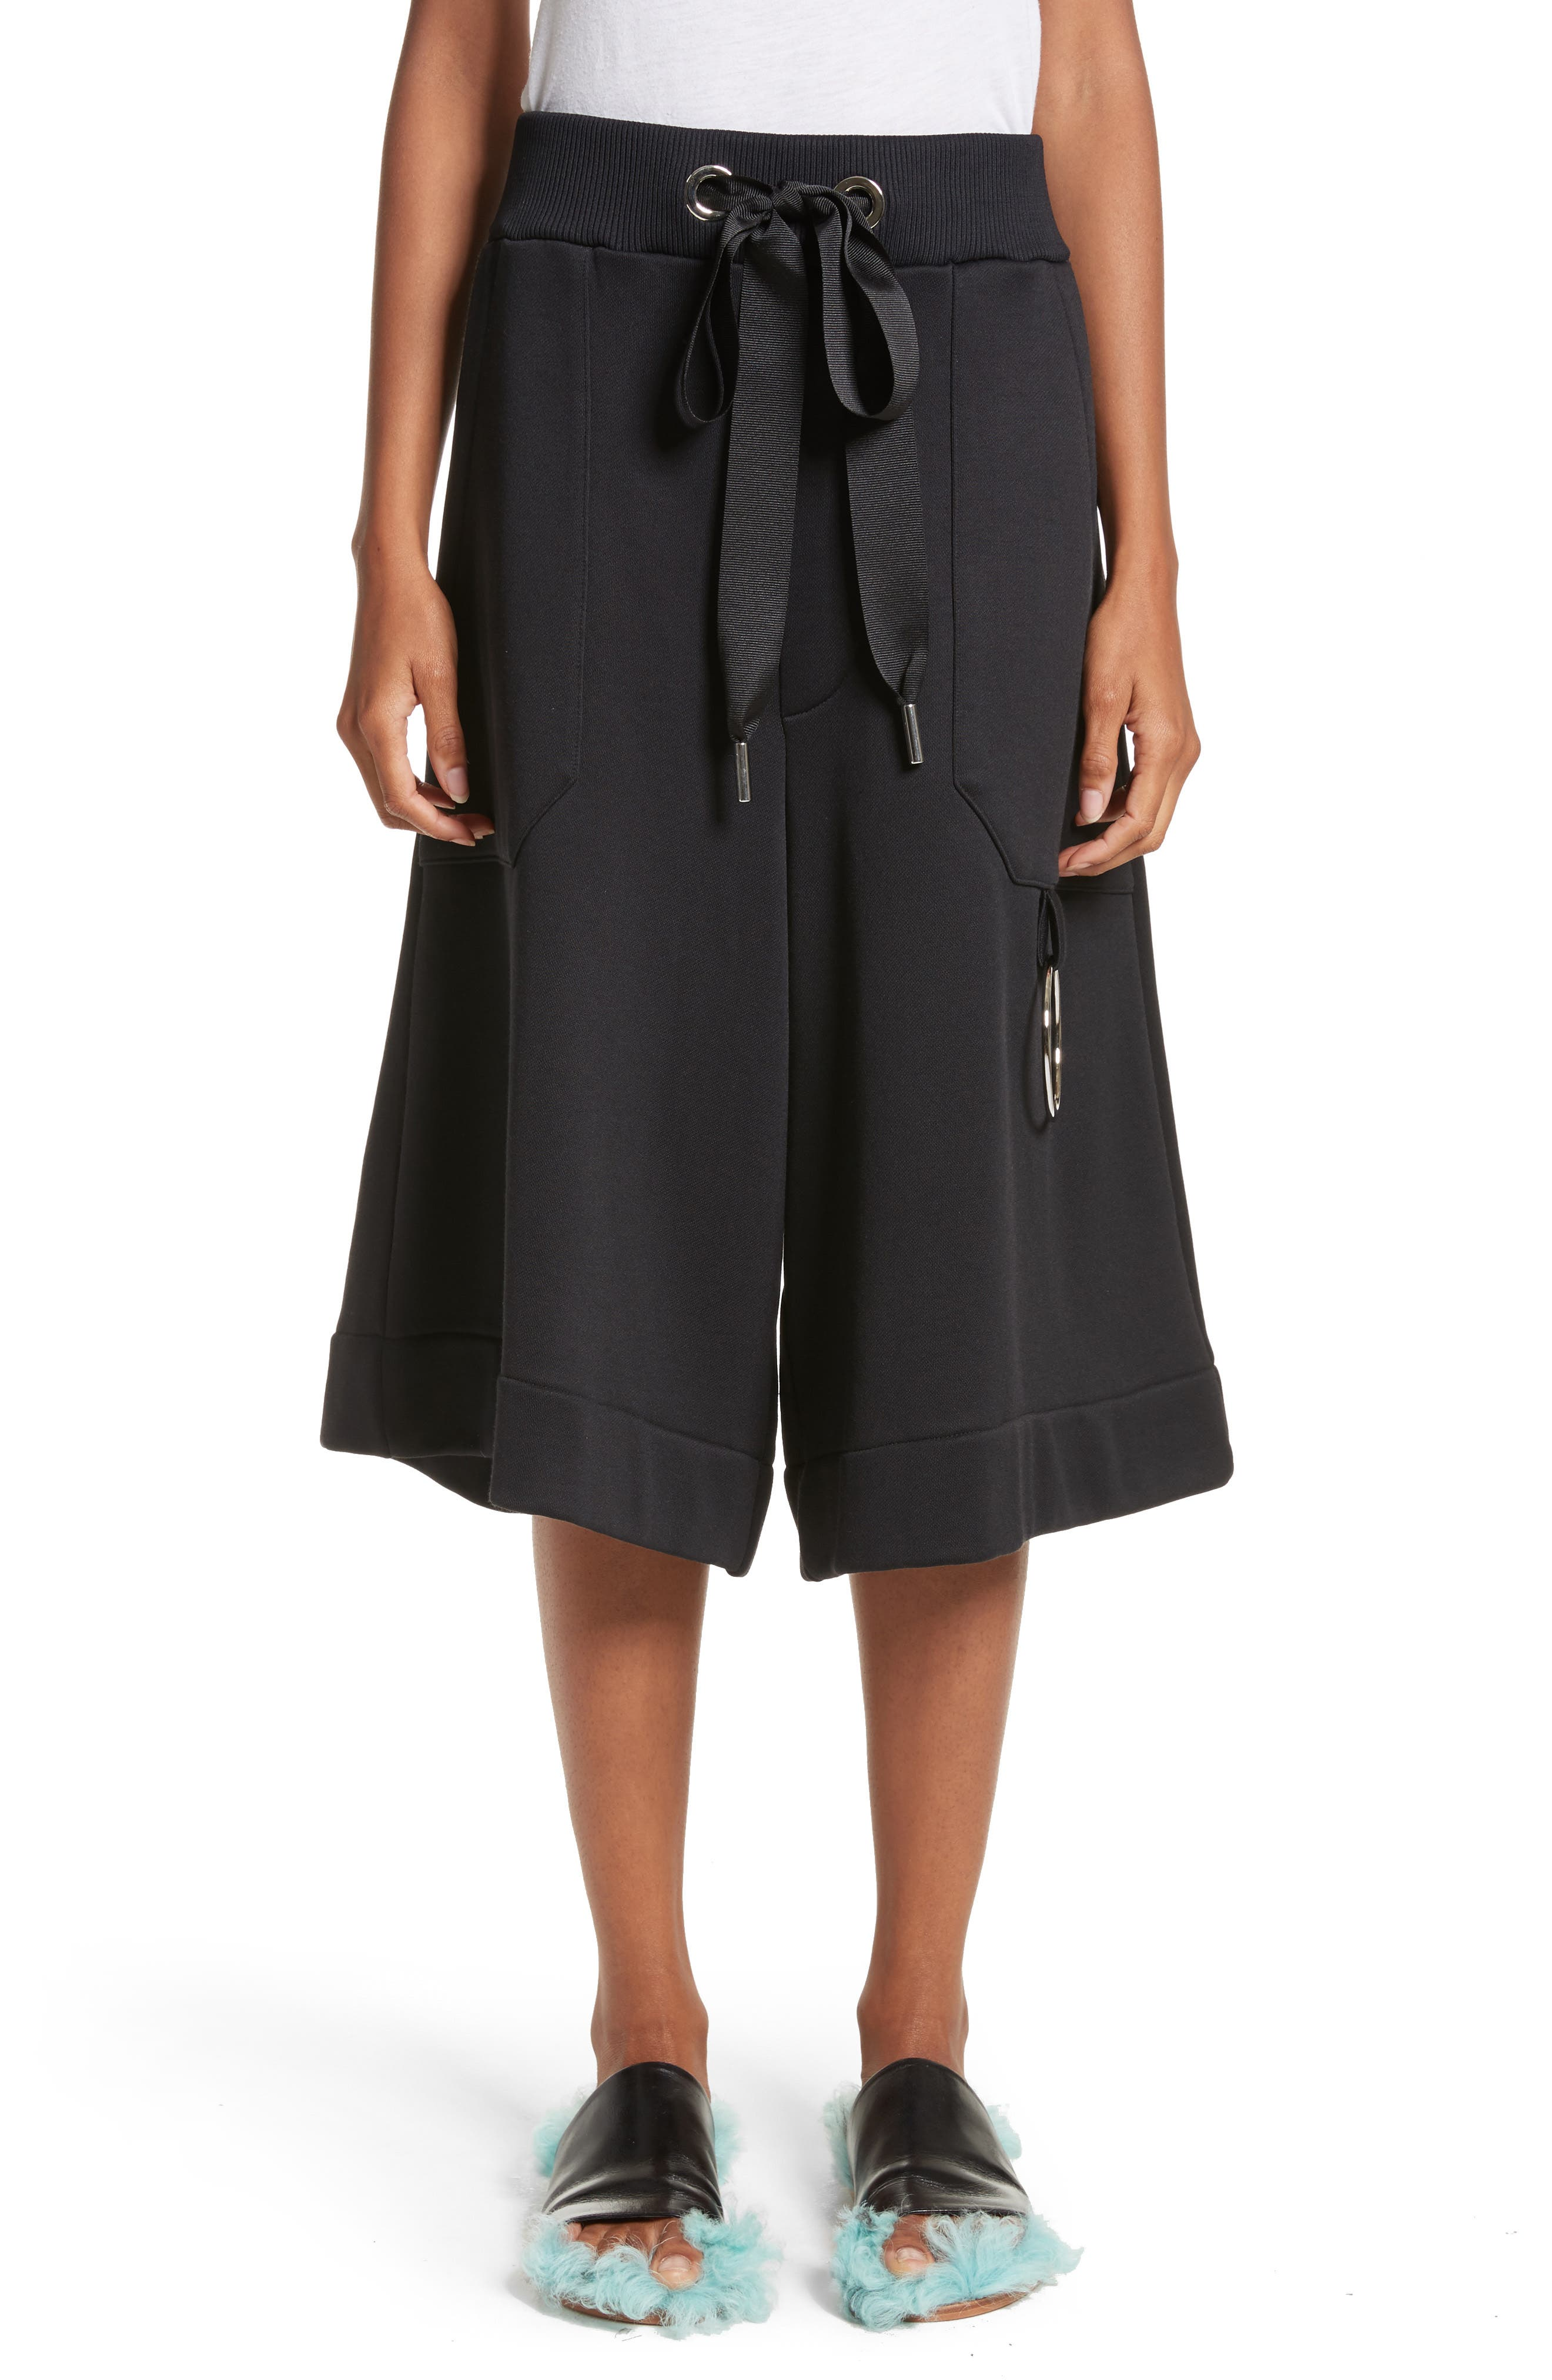 Marques'Almeida Tracksuit Wide Leg Fleece Shorts